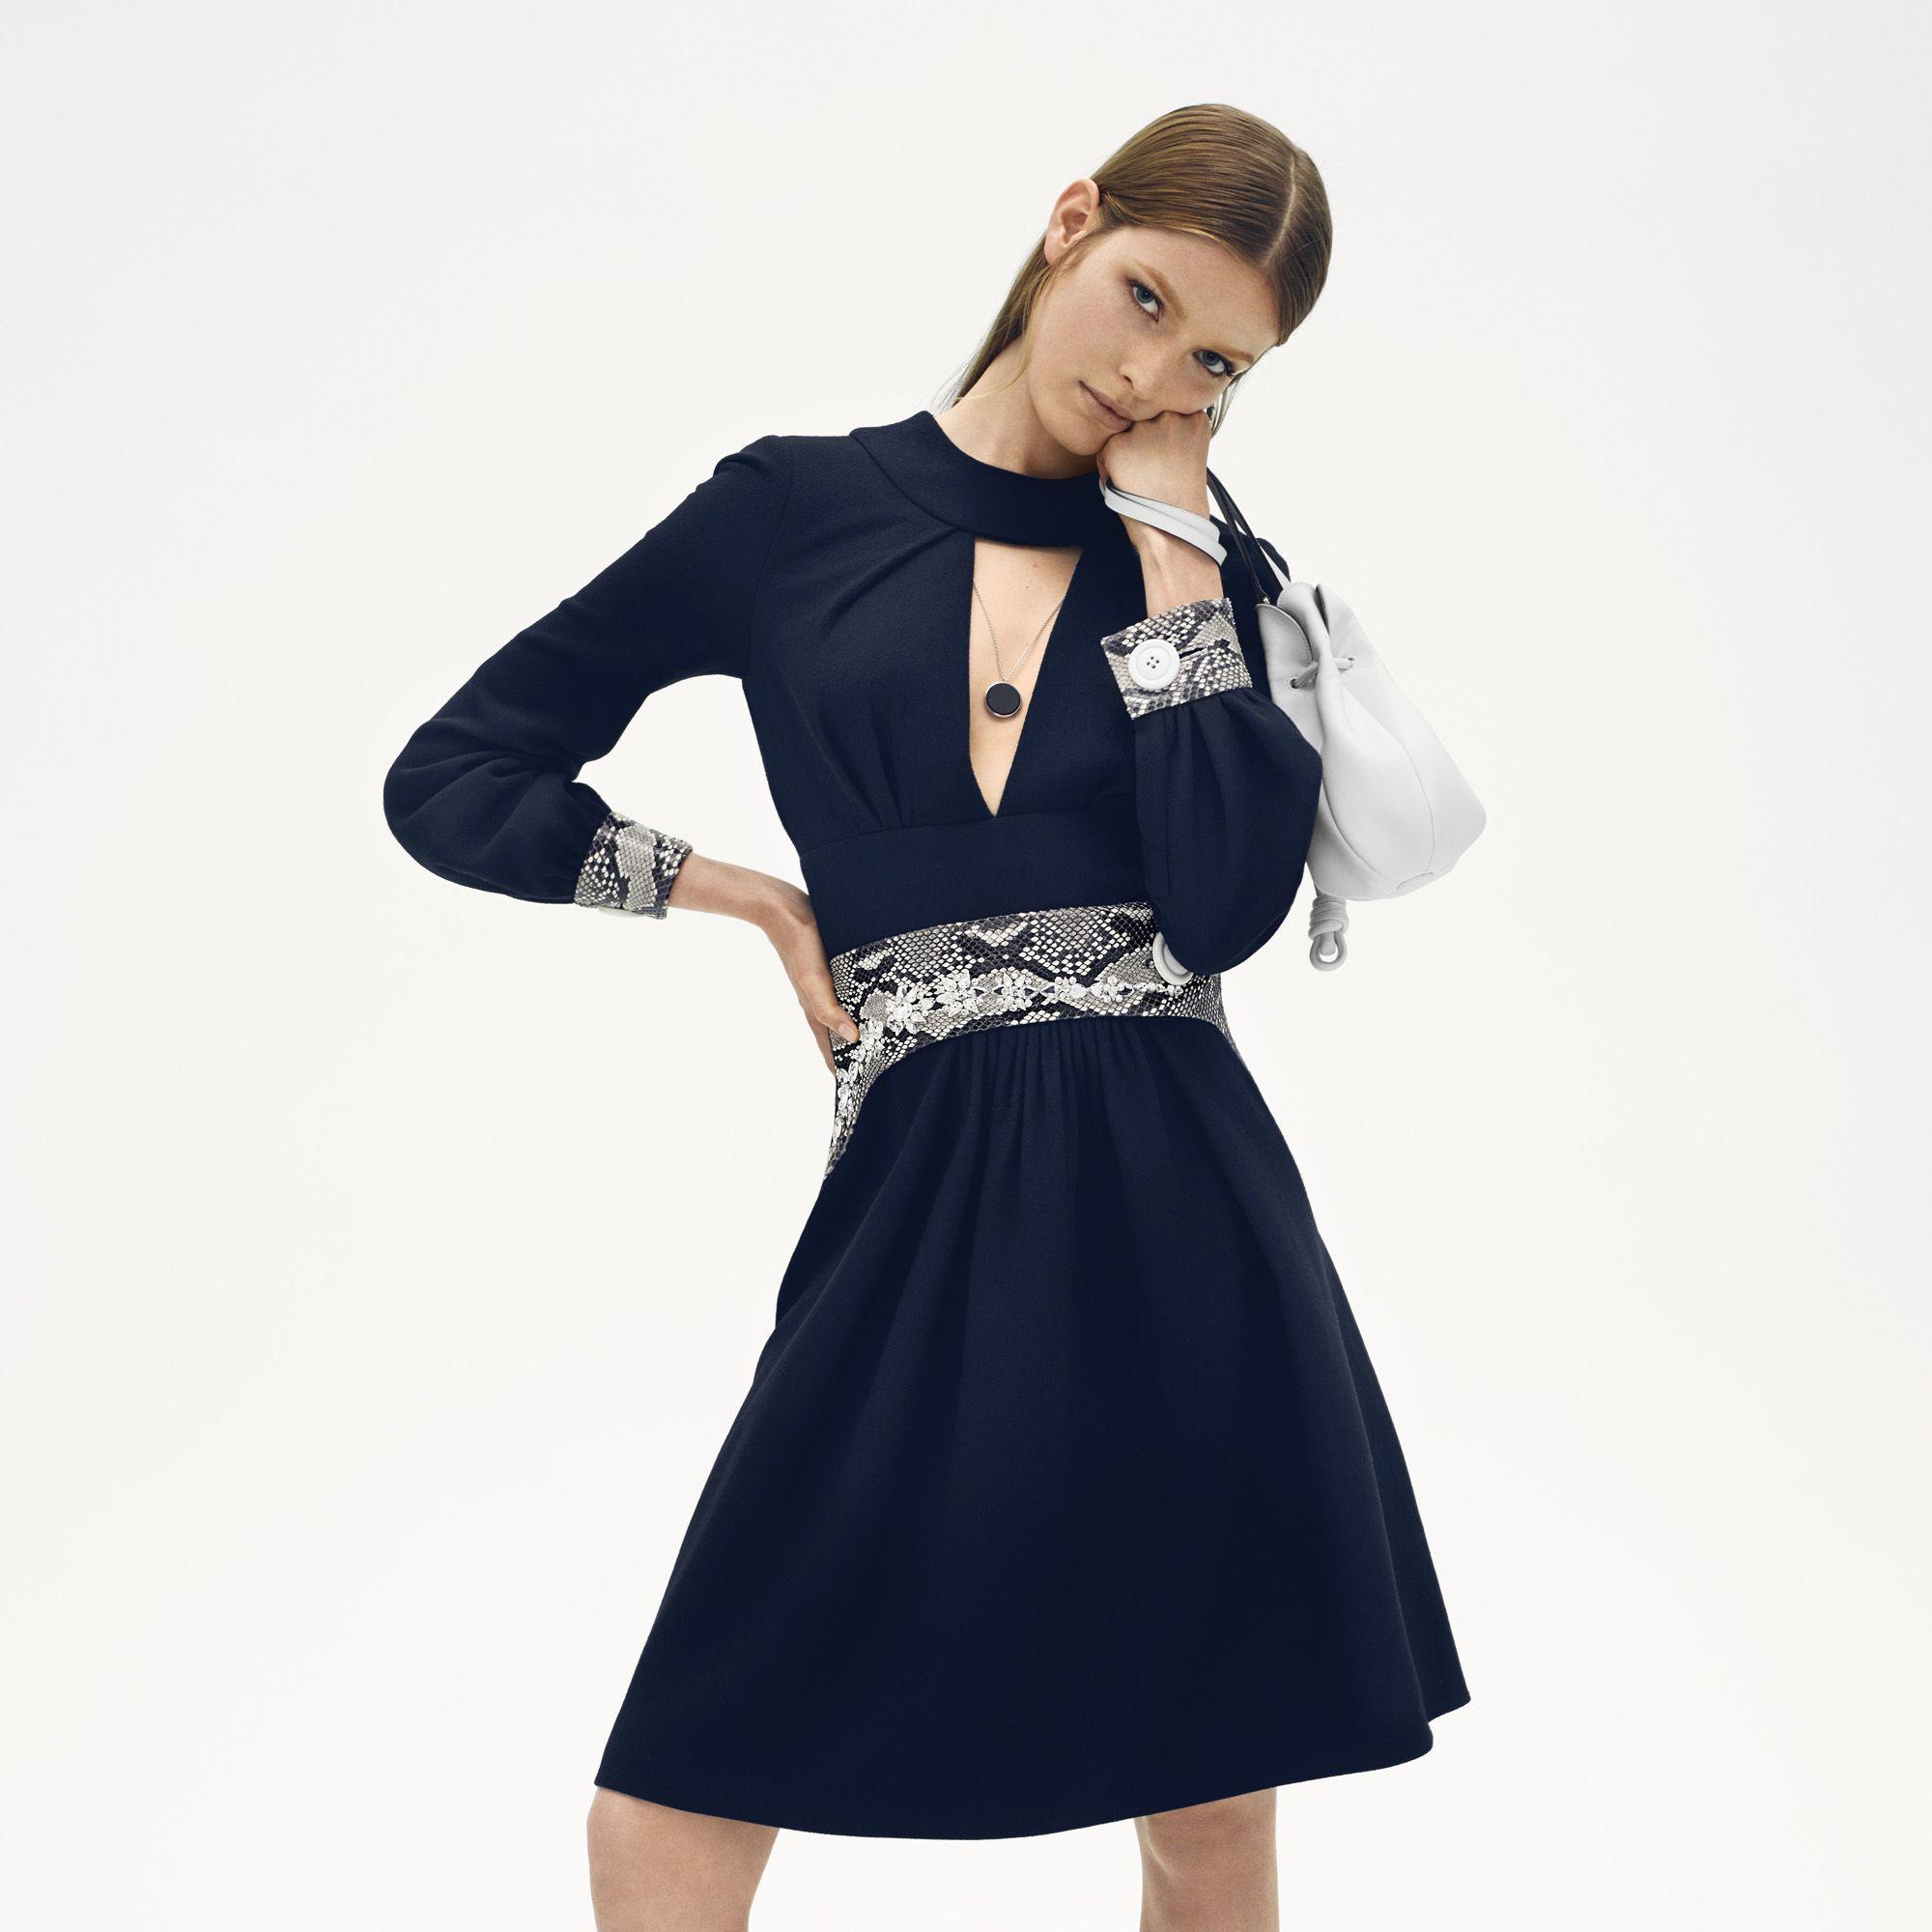 "<p><strong>Miu Miu </strong>dress, $5,325, <a href=""http://www.miumiu.com"" target=""_blank"">miumiu.com</a>&#x3B; <strong>Loewe </strong>bag, $1,150, <a href=""http://www.loewe.com"" target=""_blank"">loewe.com</a>&#x3B; <strong>Tom Wood</strong> necklace, $320, <a href=""http://www.tomwoodproject.com"" target=""_blank"">tomwoodproject.com</a>&#x3B;<strong> Louis Vuitton</strong> shoes, price upon request, <a href=""http://www.louisvuitton.com"" target=""_blank"">louisvuitton.com</a>. </p>"